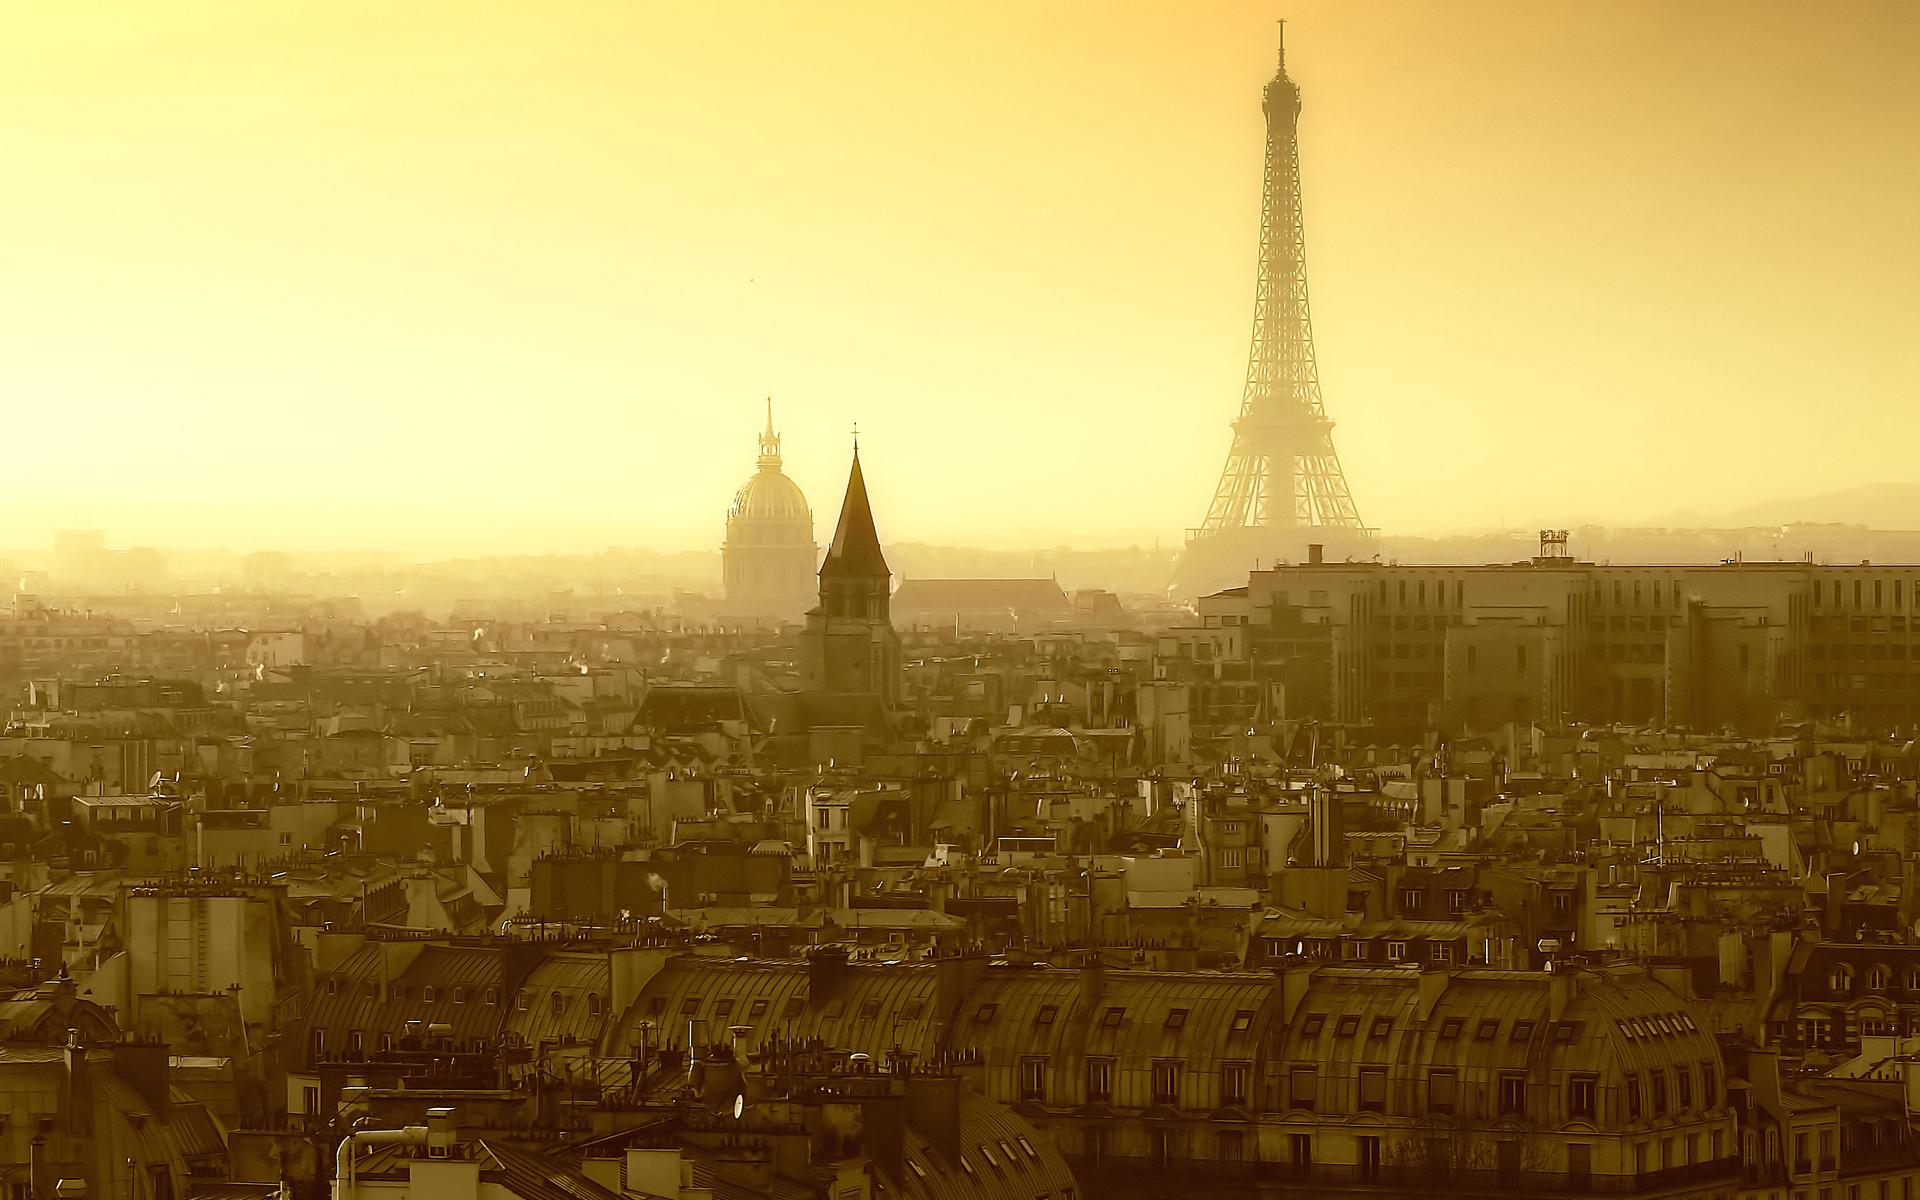 Париж эйфелева башня небо желтое